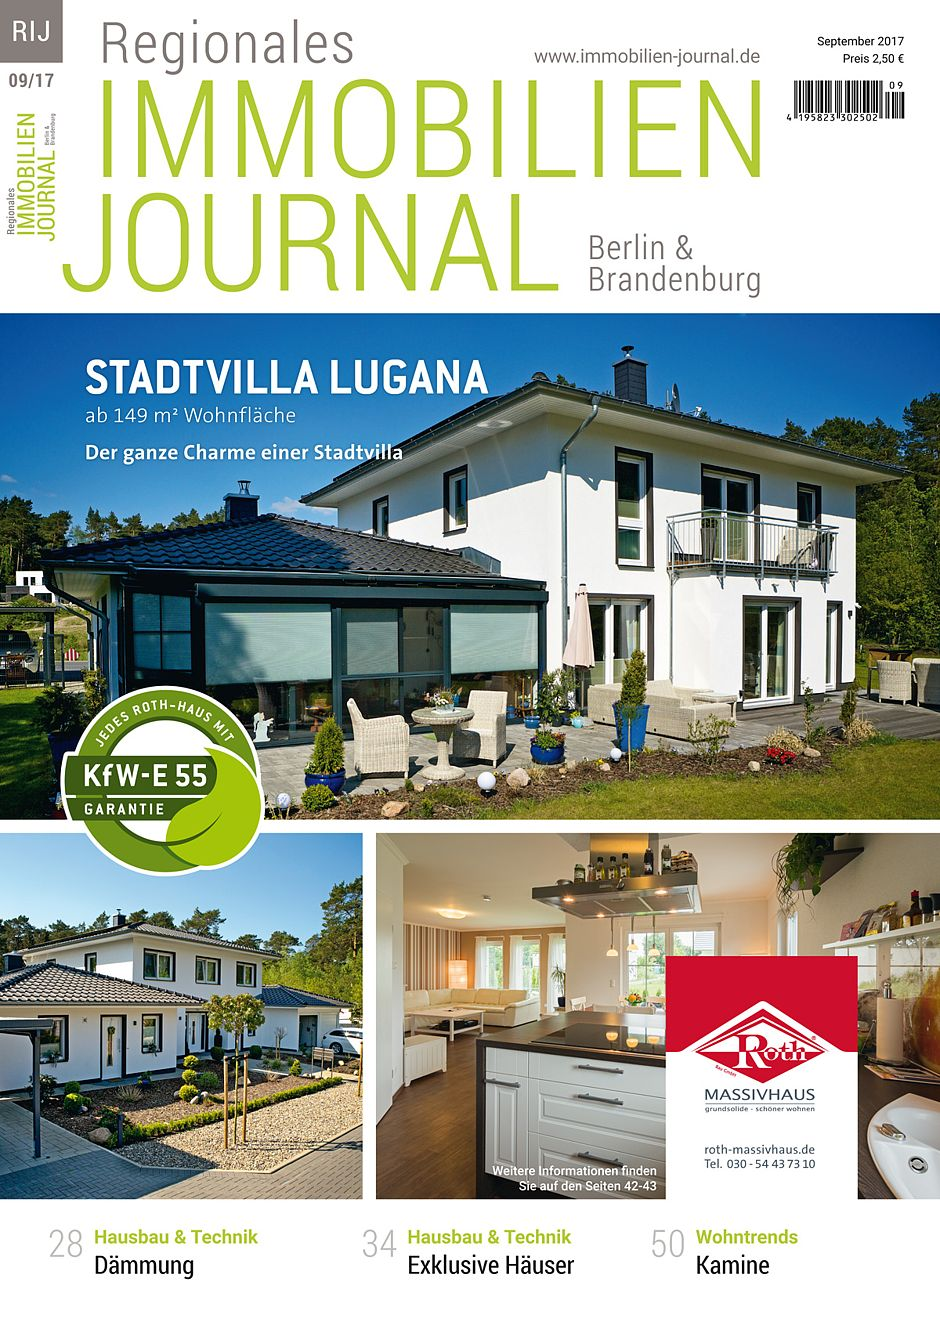 regionales immobilien journal berlin brandenburg. Black Bedroom Furniture Sets. Home Design Ideas